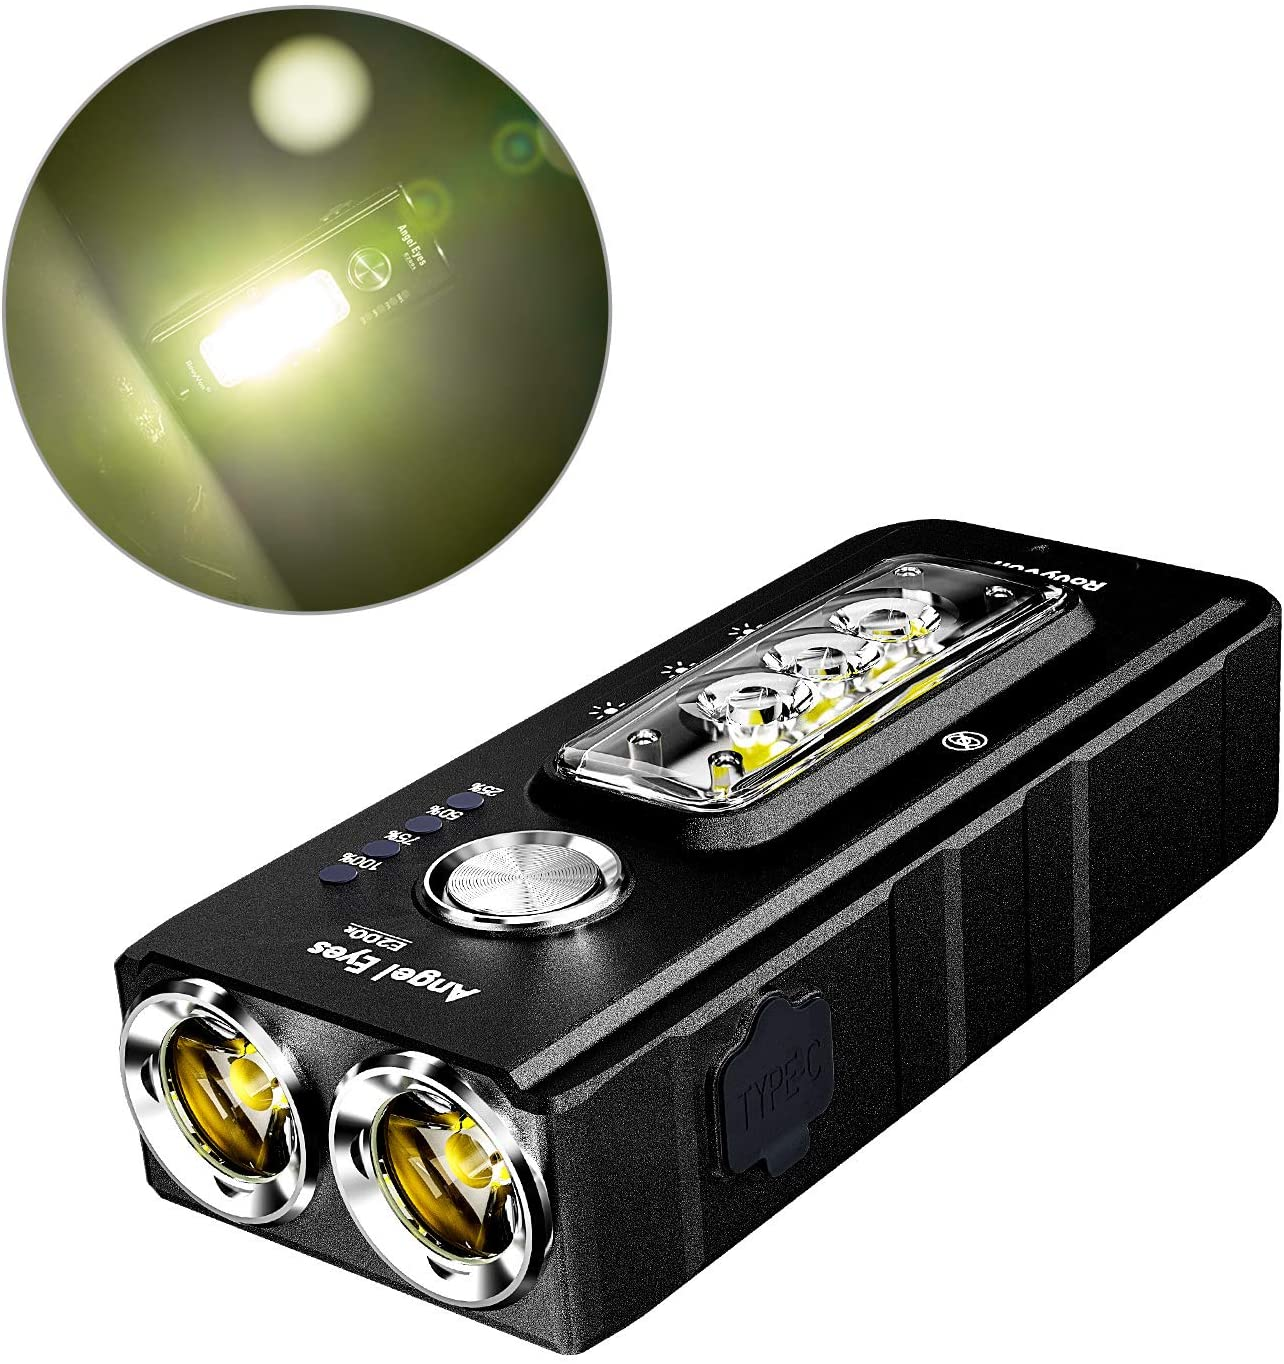 RovyVon E200S EDC Flashlight Rechargeable, 1650 lumens, Type-C Fast Charge, LED Keychain Flashlight